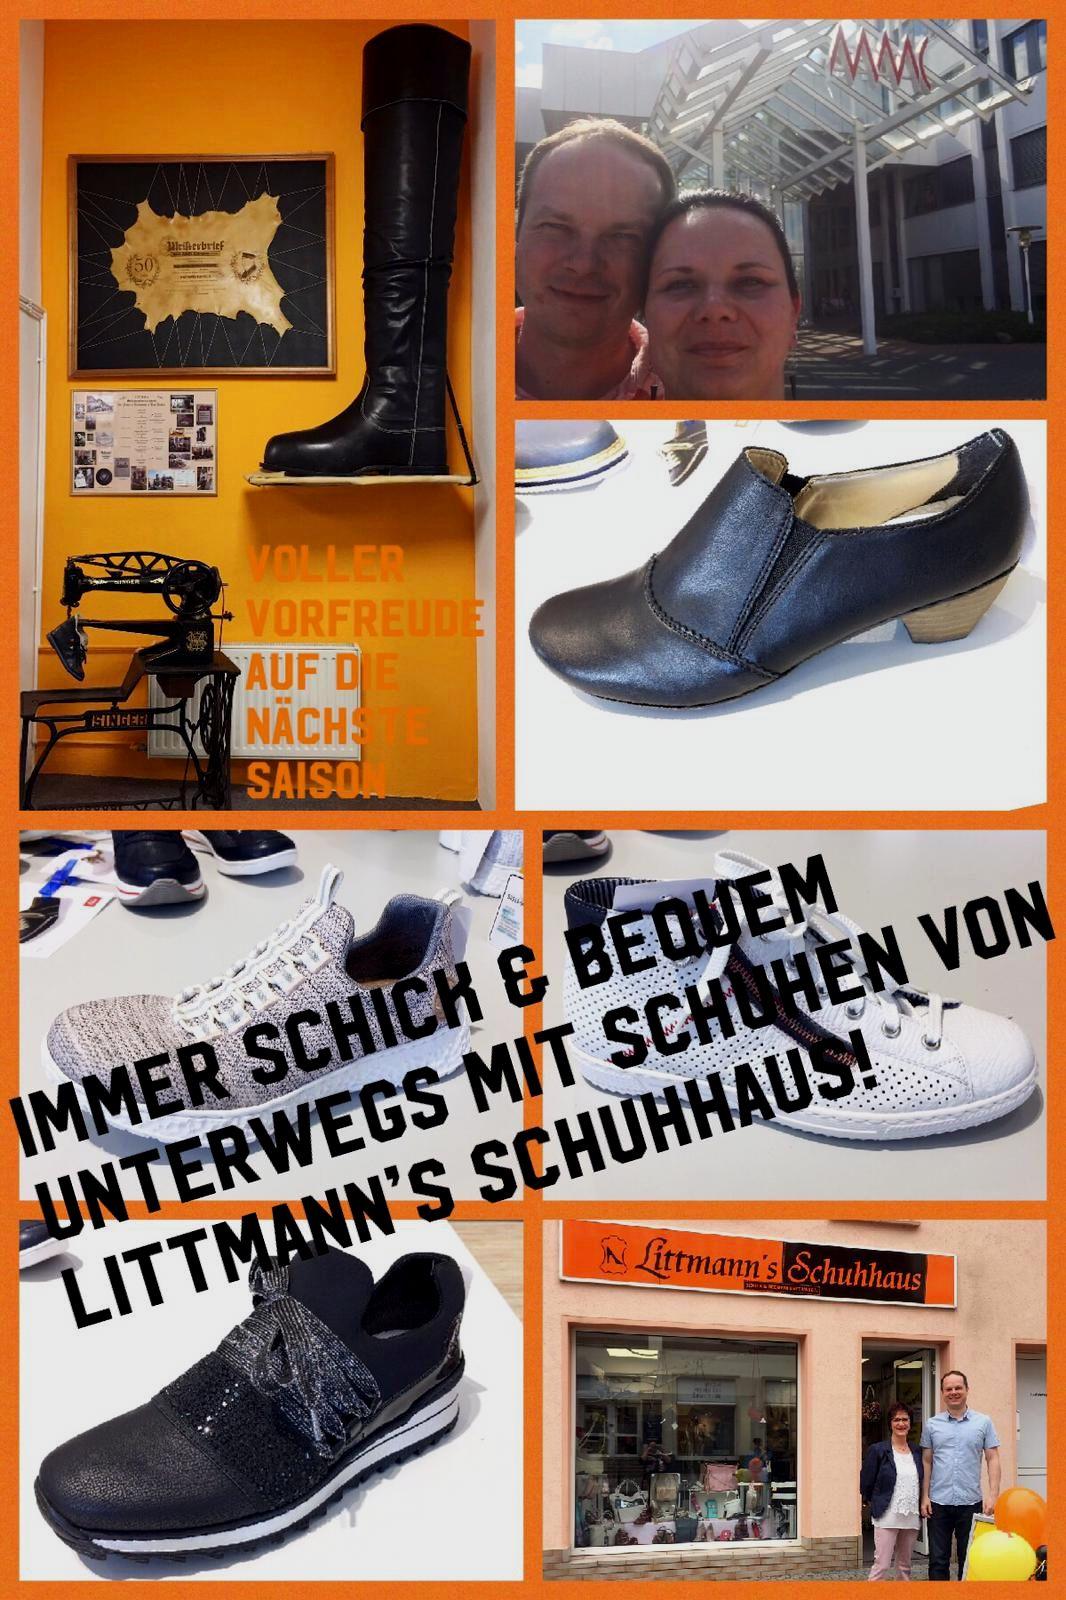 Littmann's Schuhhaus